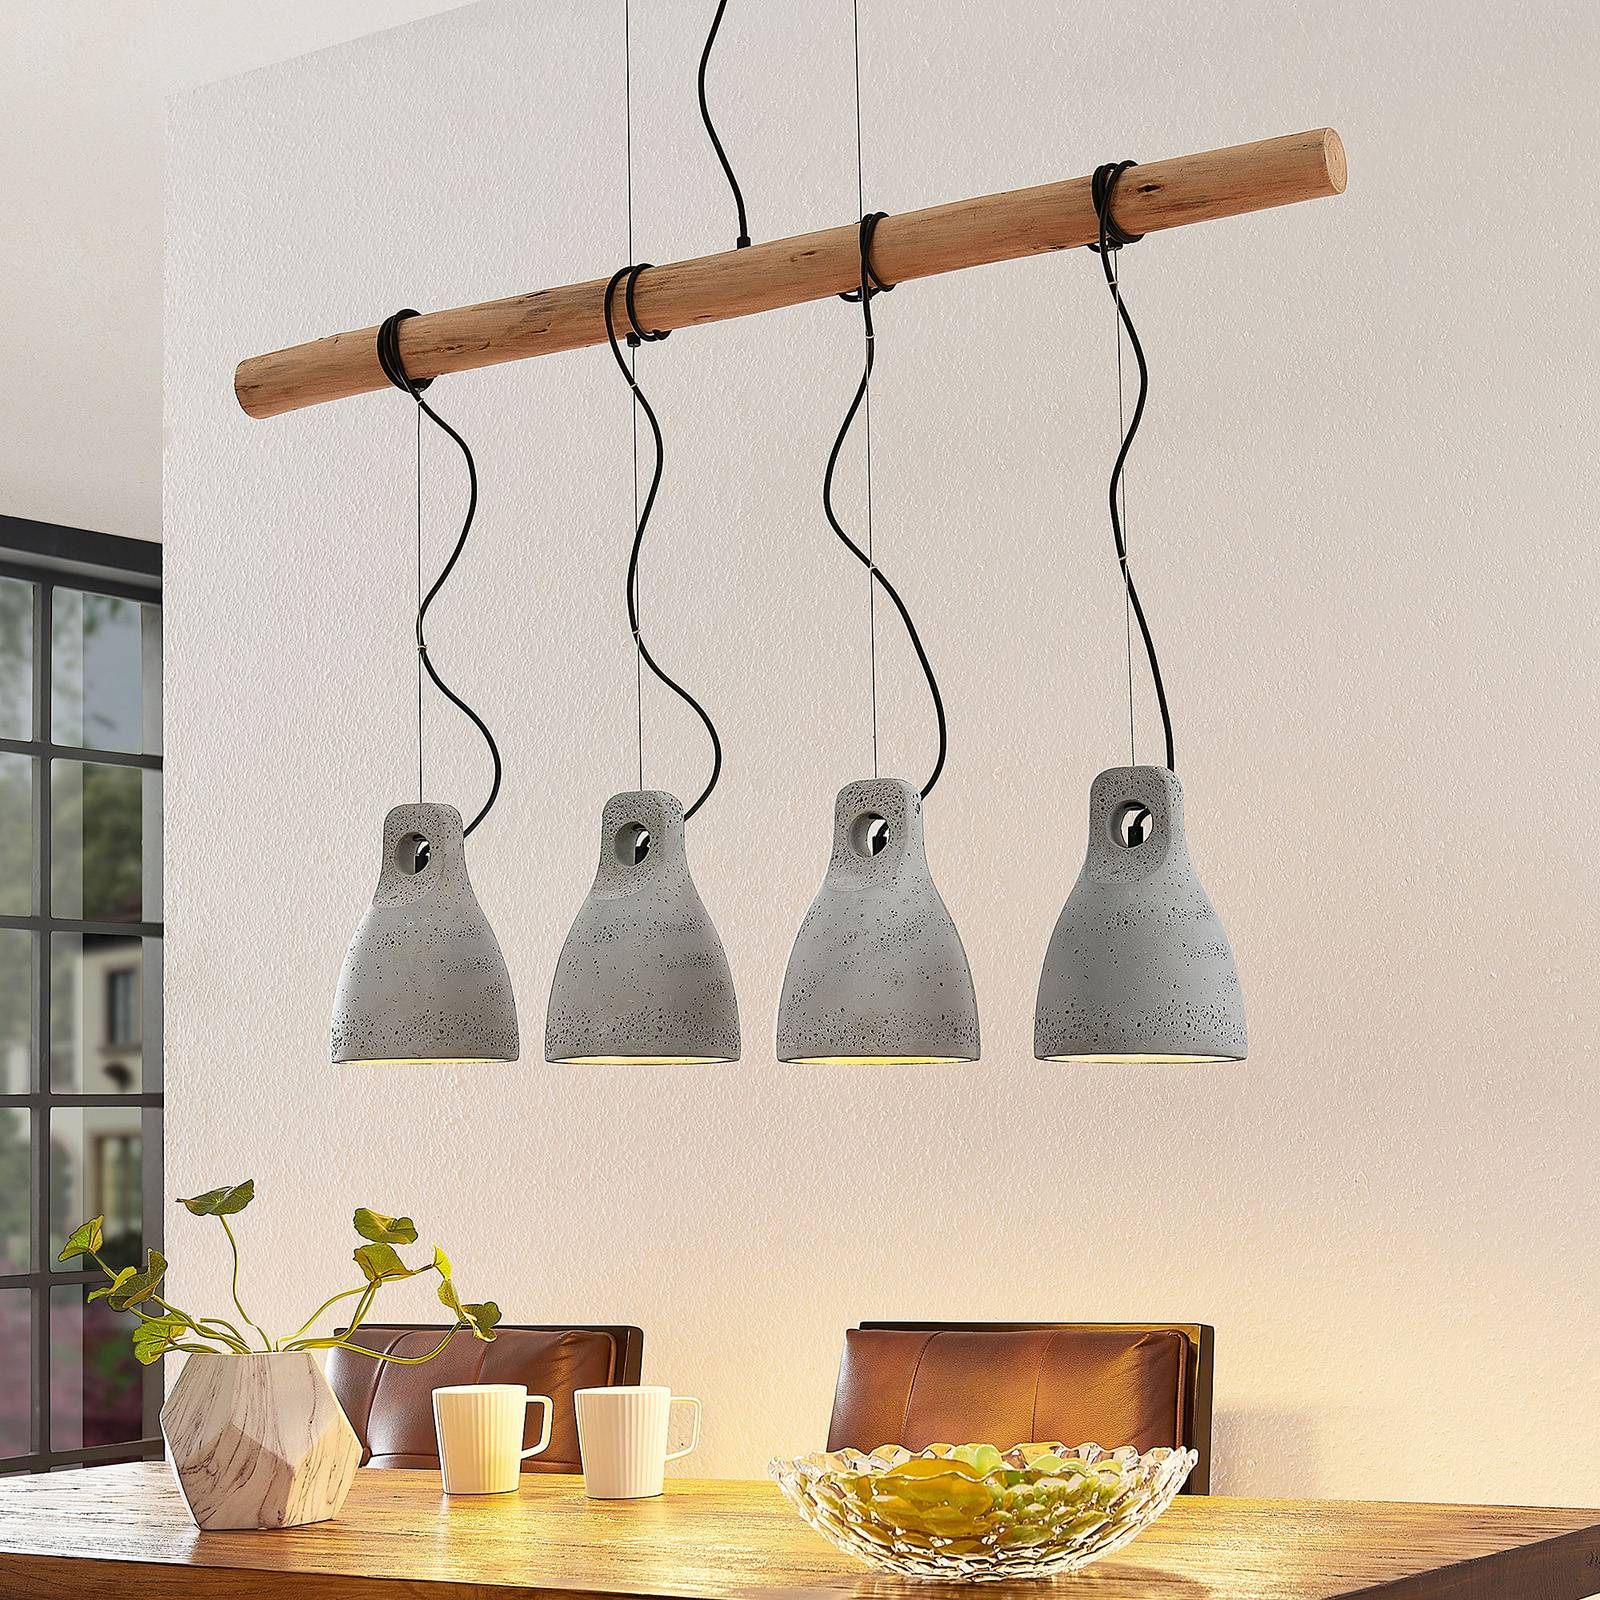 Lindby Grima hanglamp van beton, 4-lamps